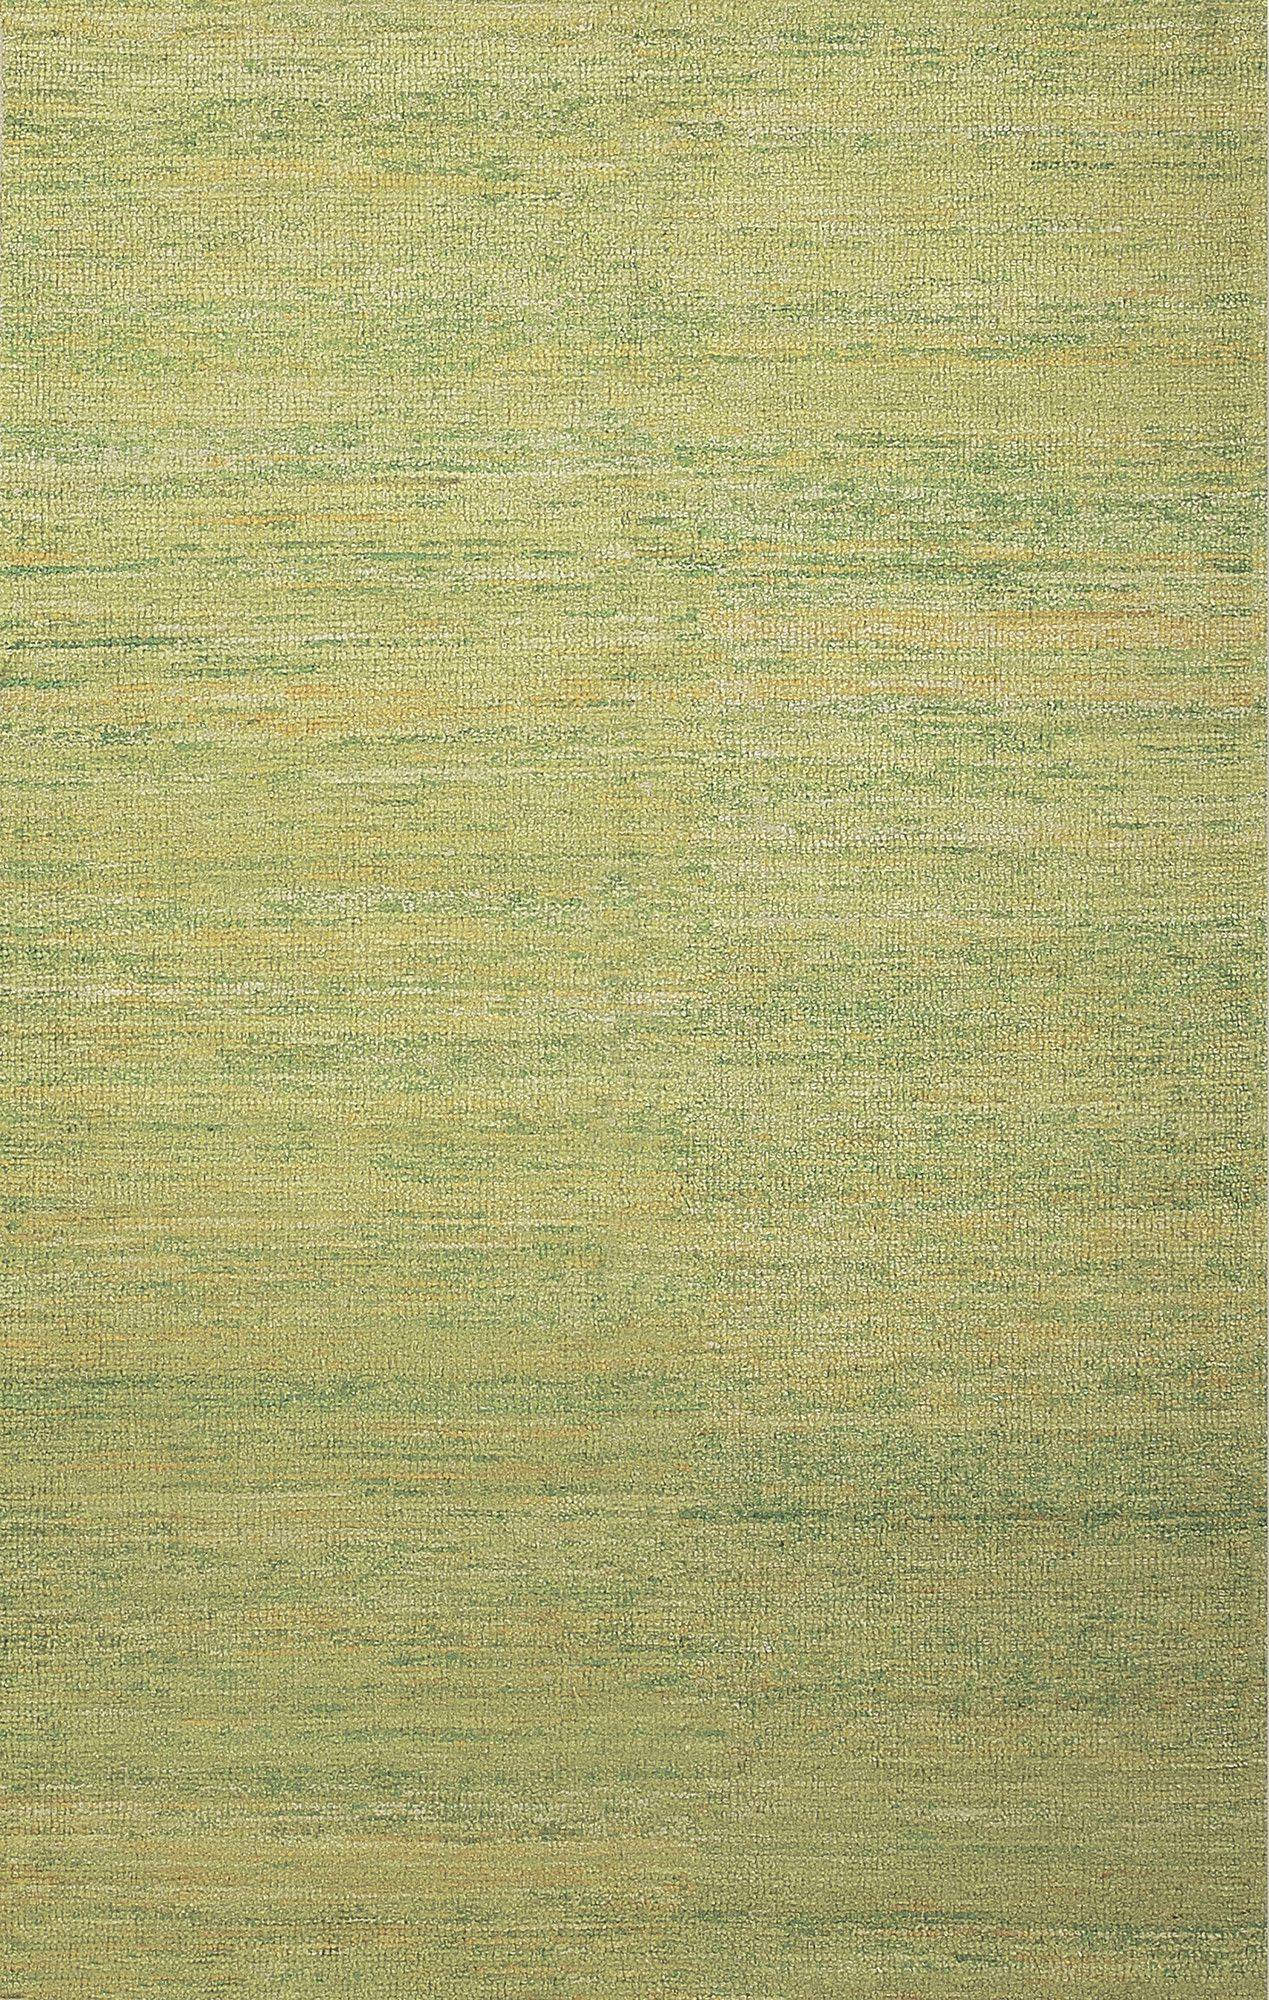 Chic Sage Green Rug